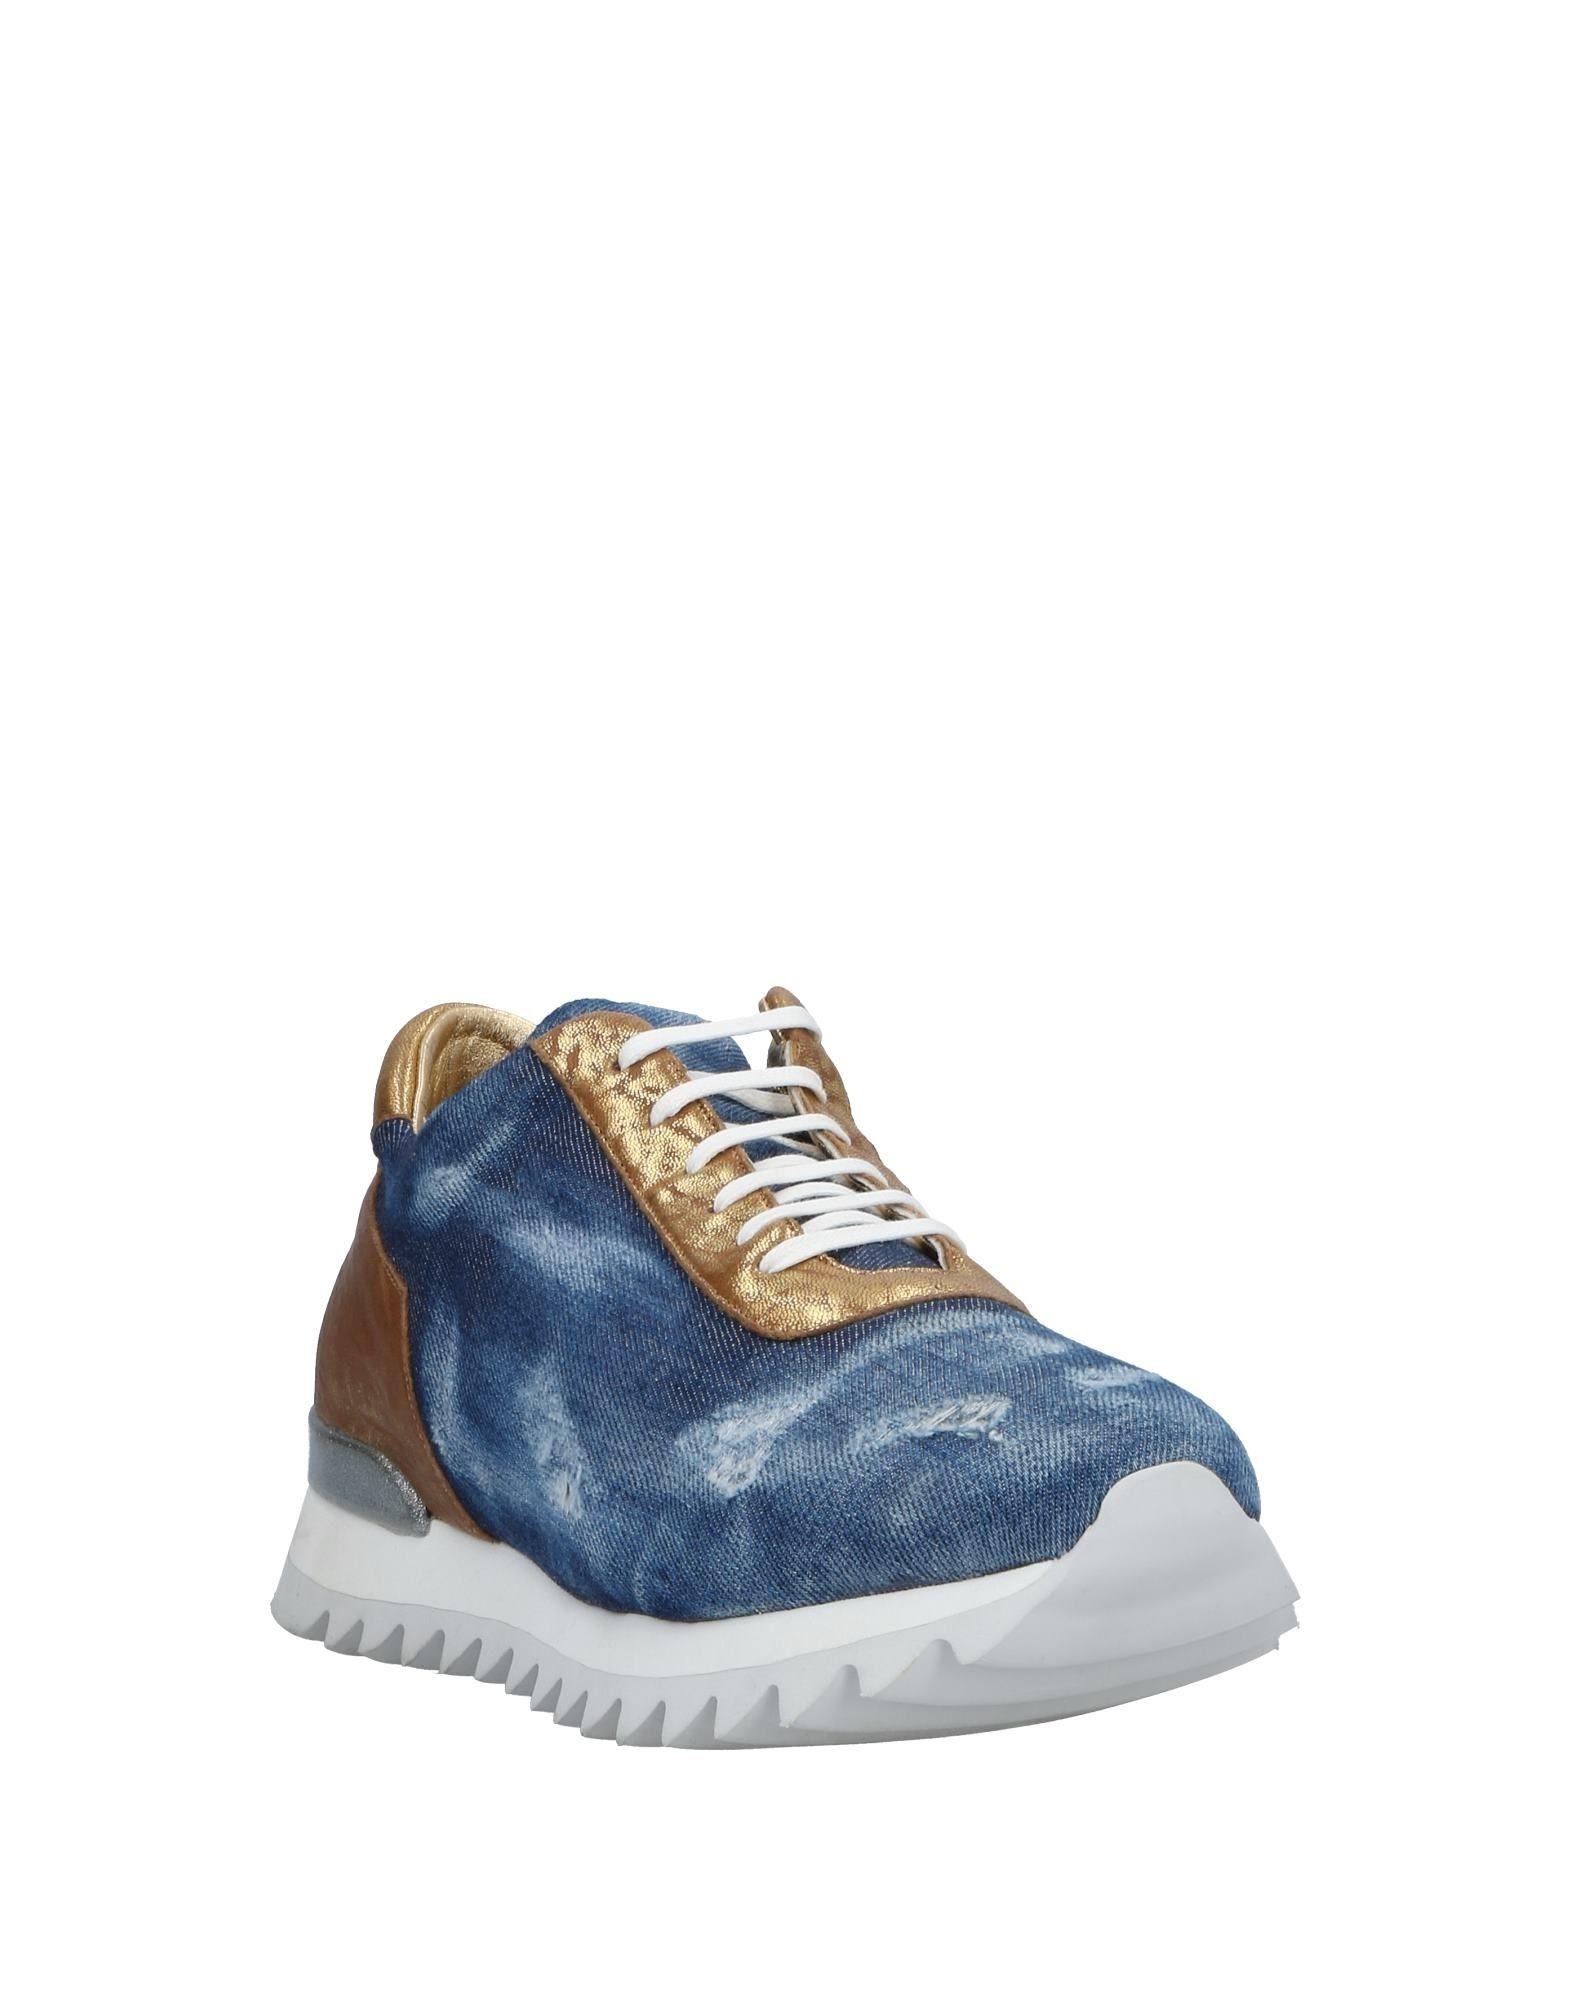 Stilvolle billige  Schuhe Smeet Sneakers Damen  billige 11531845SU 9a7d9b